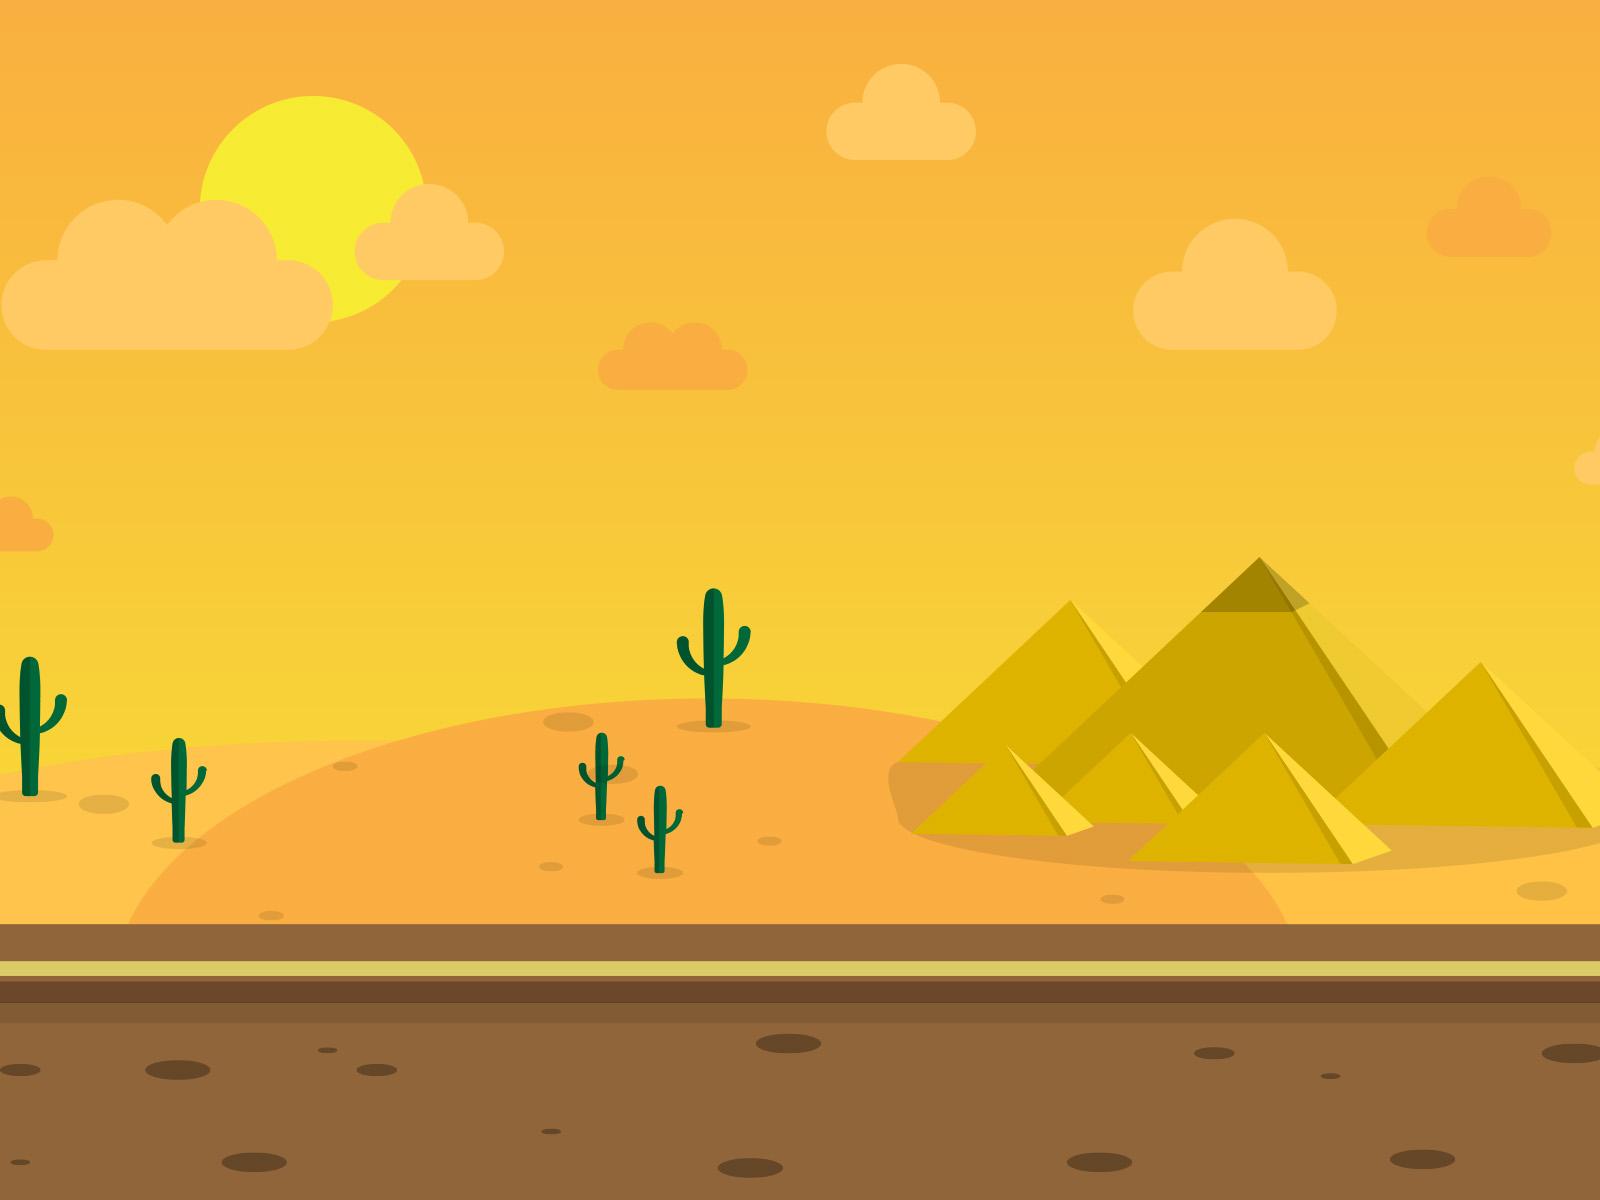 Egypt deserts backgrounds for powerpoint templates ppt backgrounds toneelgroepblik Images